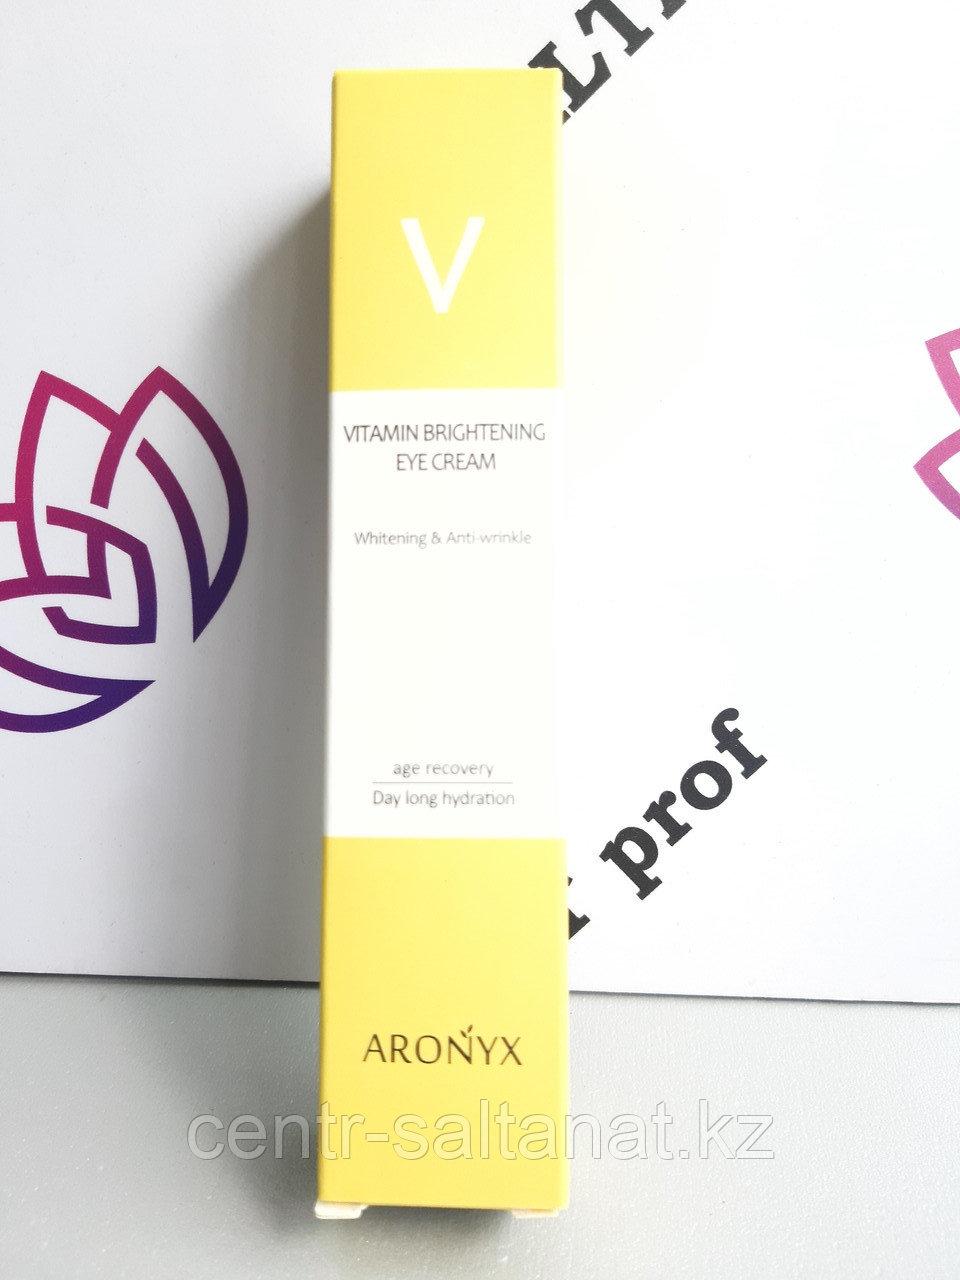 Крем для кожи вокруг глаз ARONYX Vitamin Brightening Eye Cream 40 мл